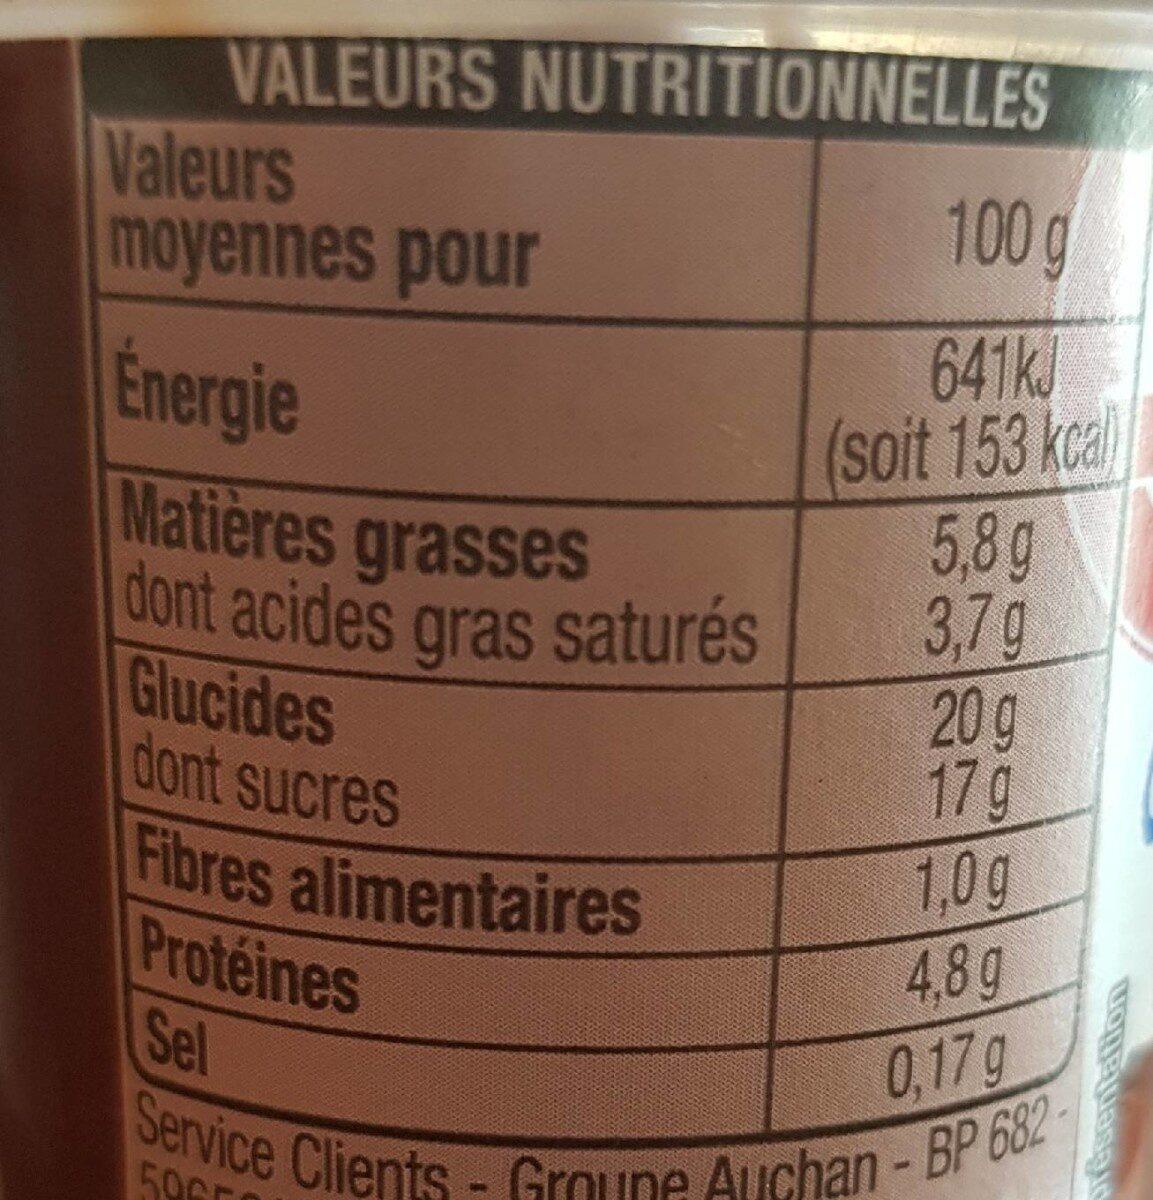 Creme dessert chocolat - Nutrition facts - fr